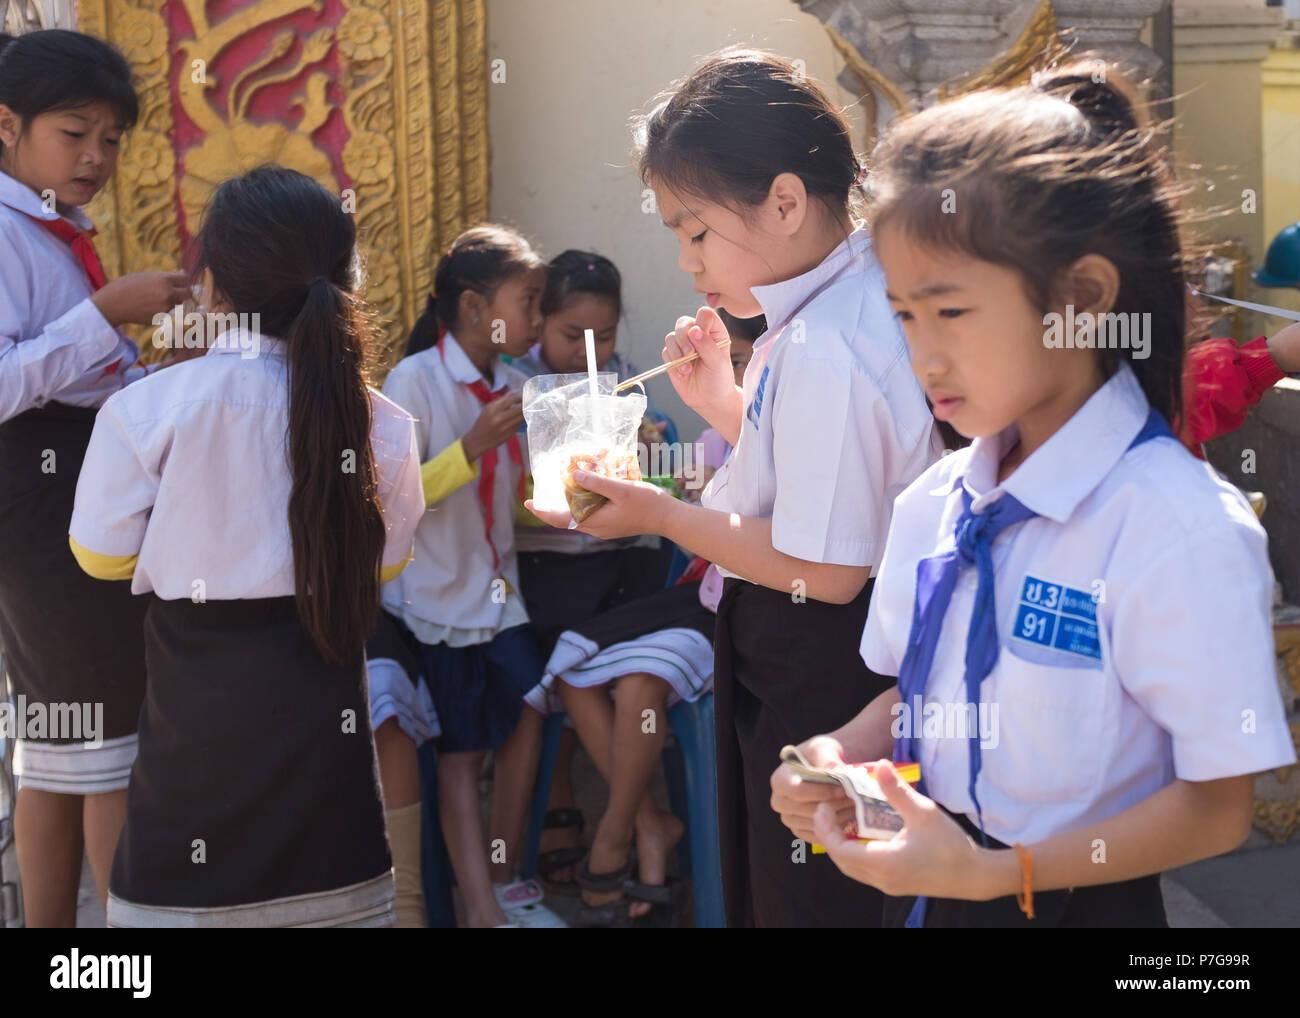 Schoolchildren eating during lunch break, Vientiane, Laos, Asia. - Stock Image